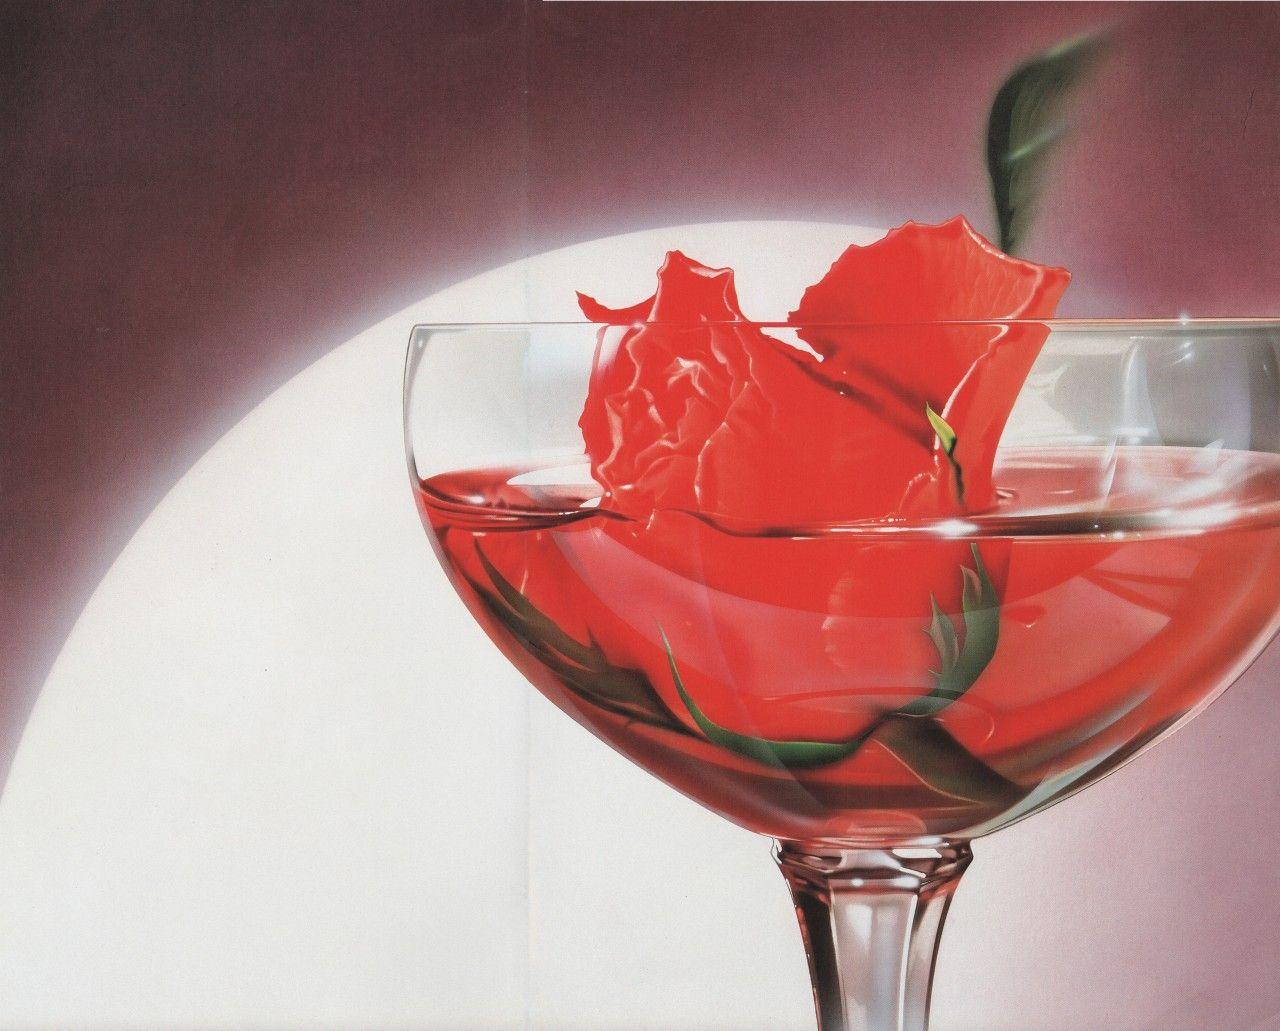 Egotrip Rose Tea Food Illustrations 80s Aesthetic